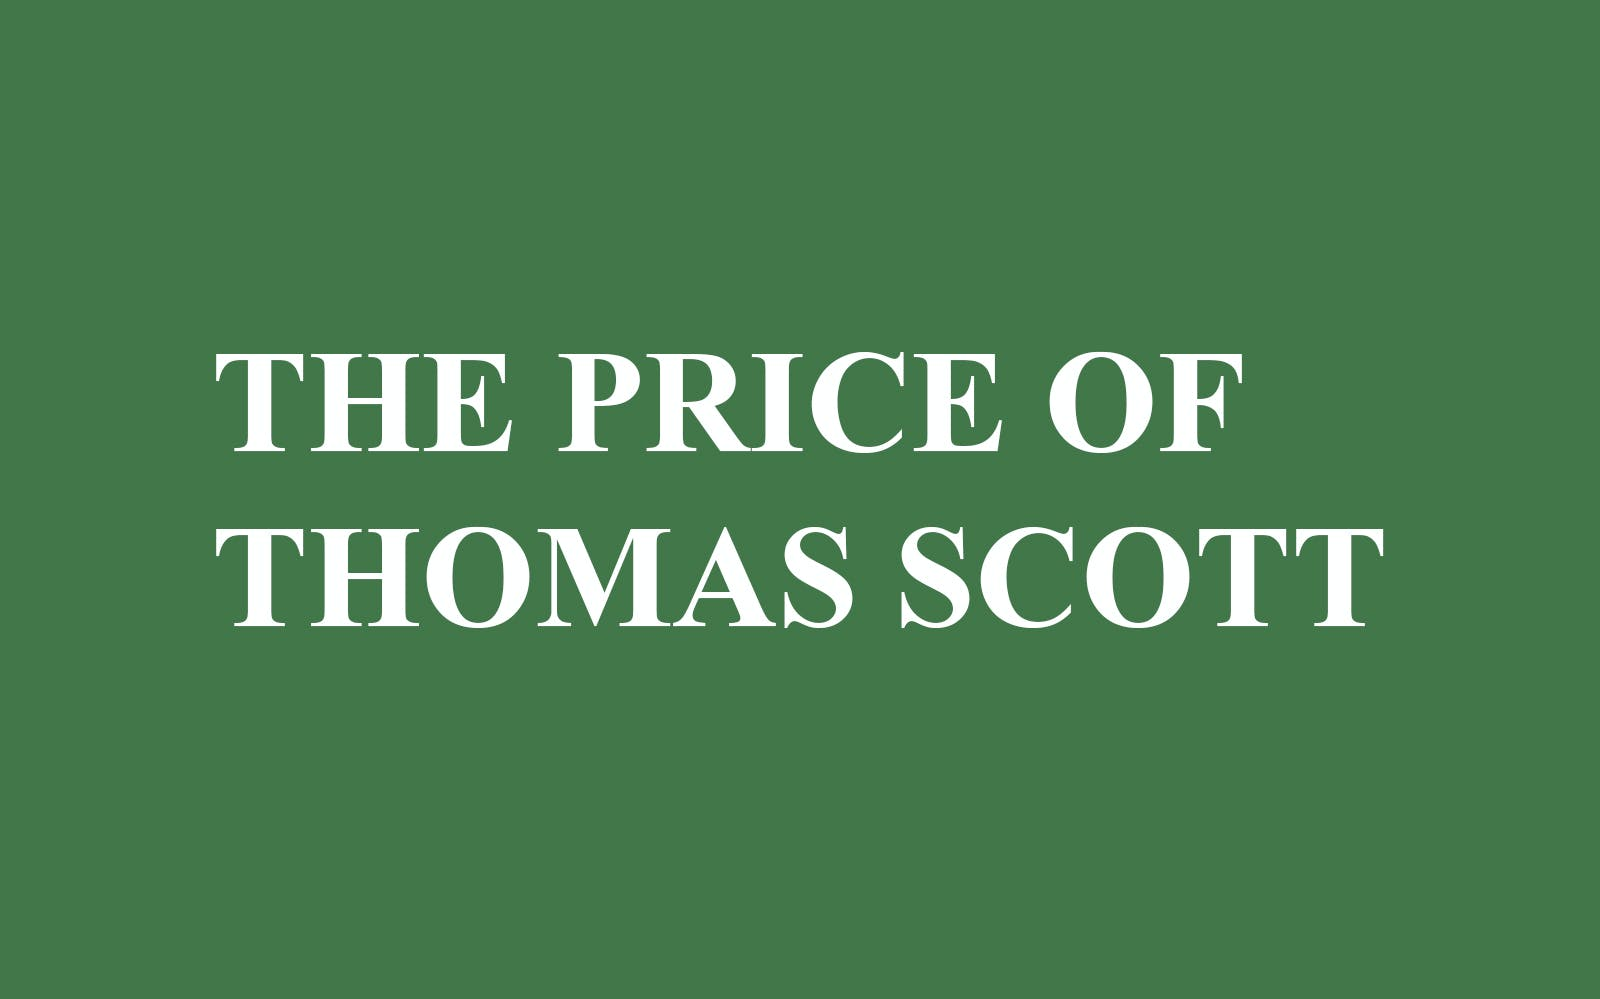 The Price of Thomas Scott 1